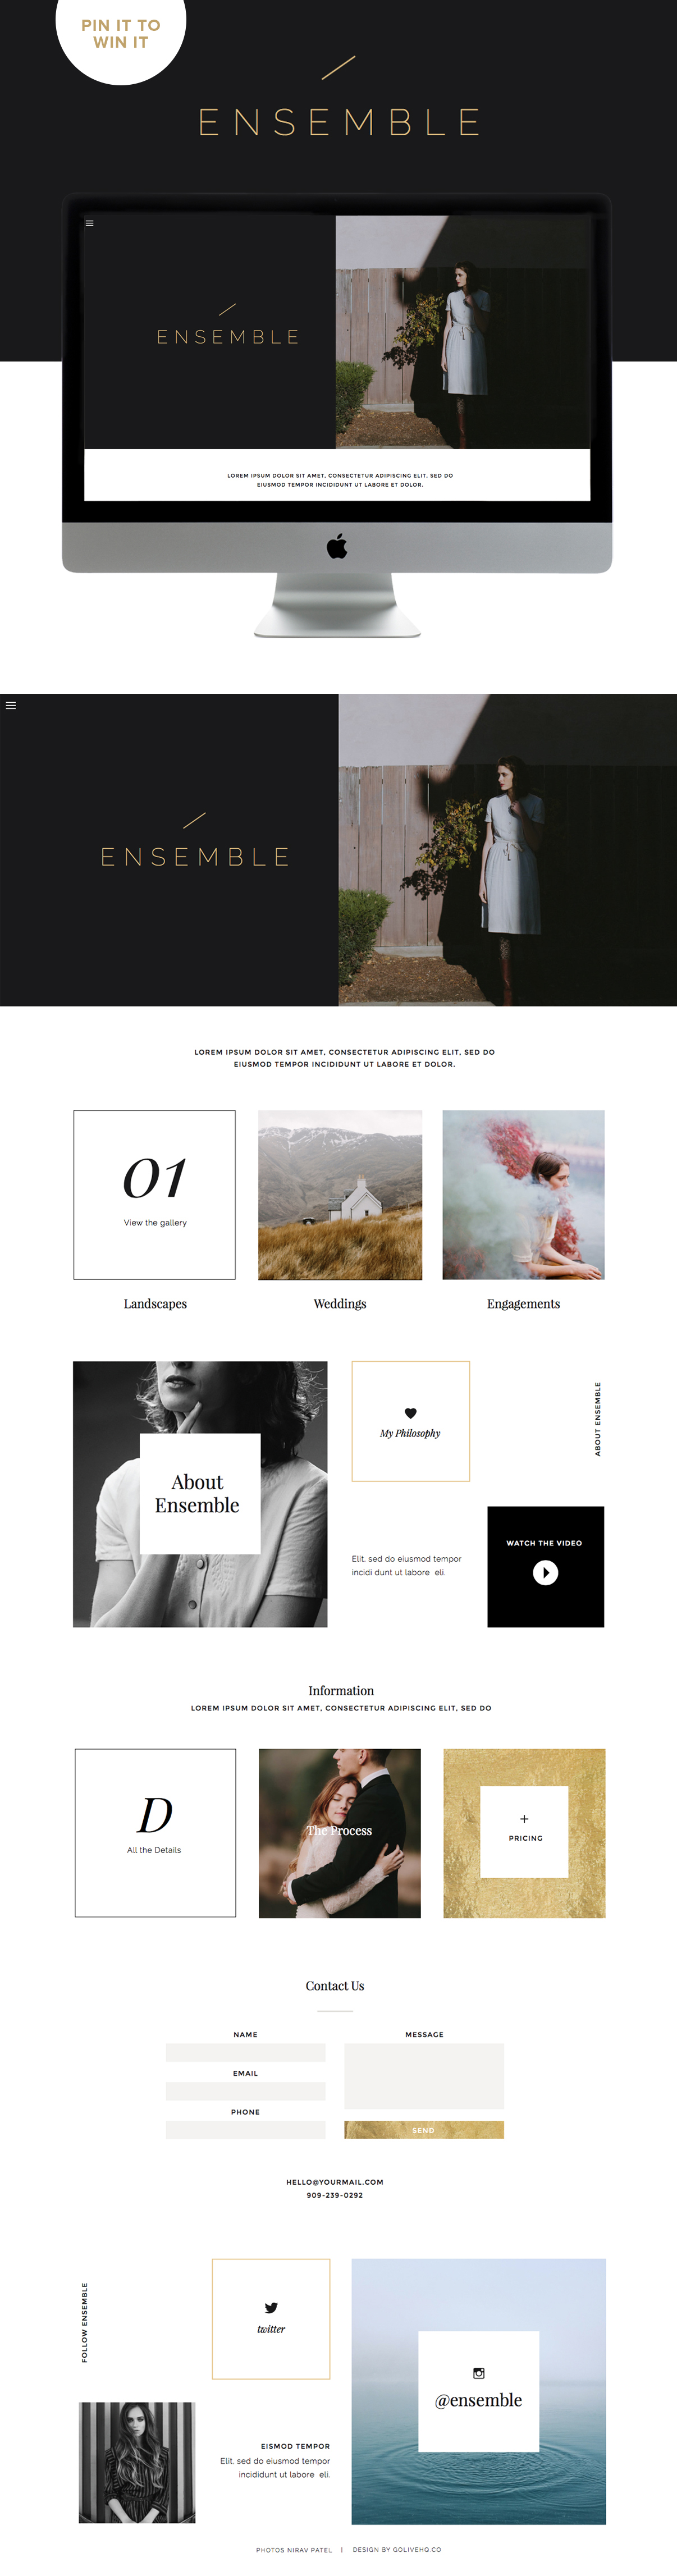 modern showit5 website inspiration by golivehq.co